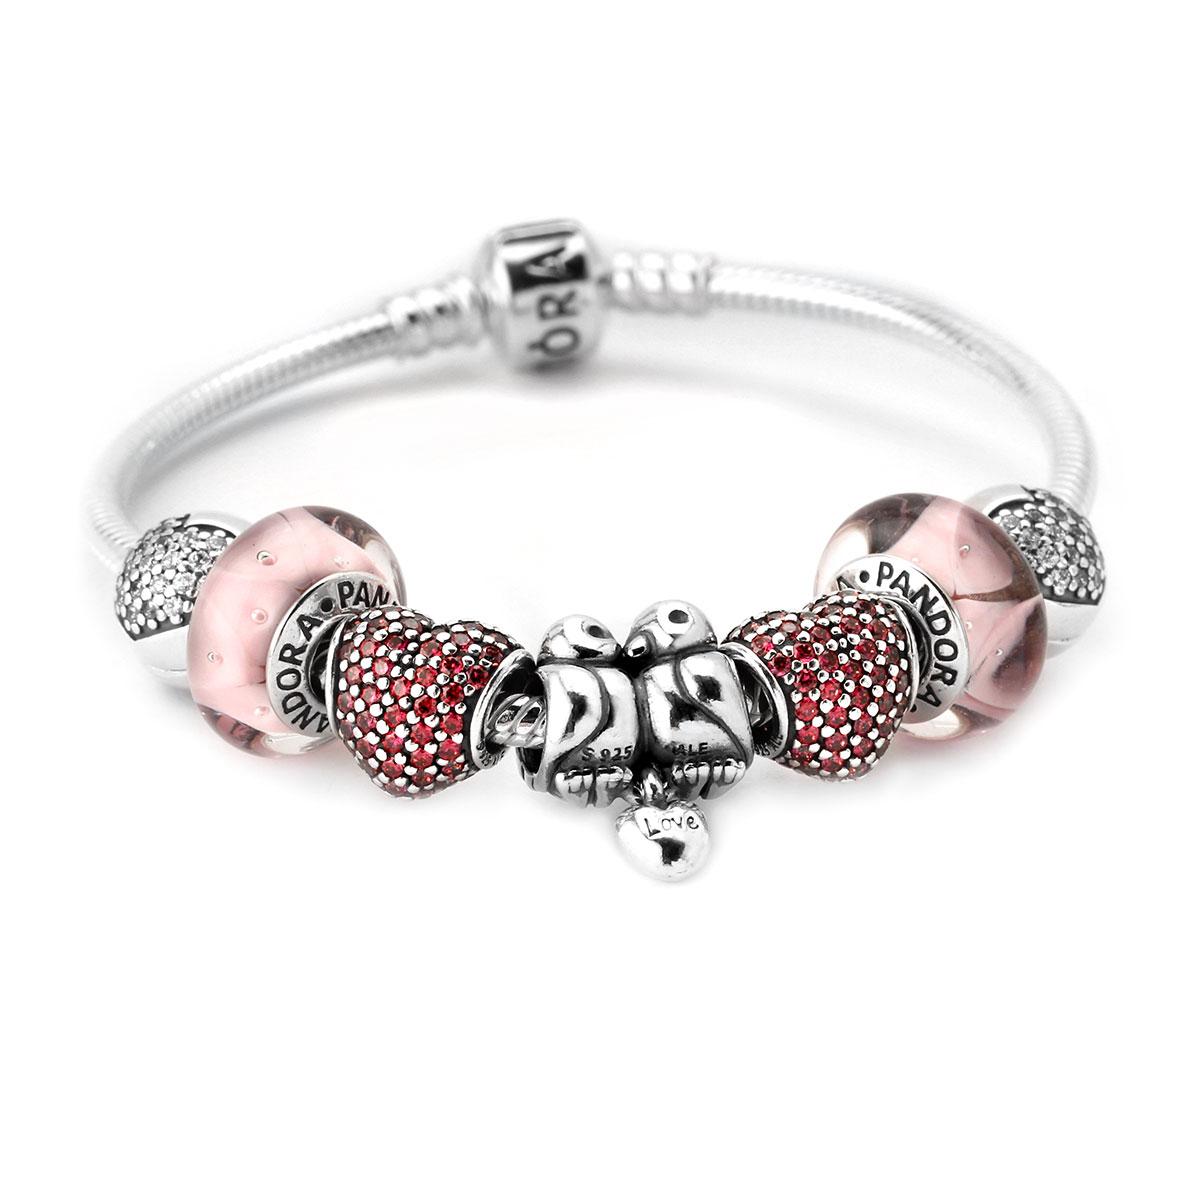 Already Made Pandora Bracelets